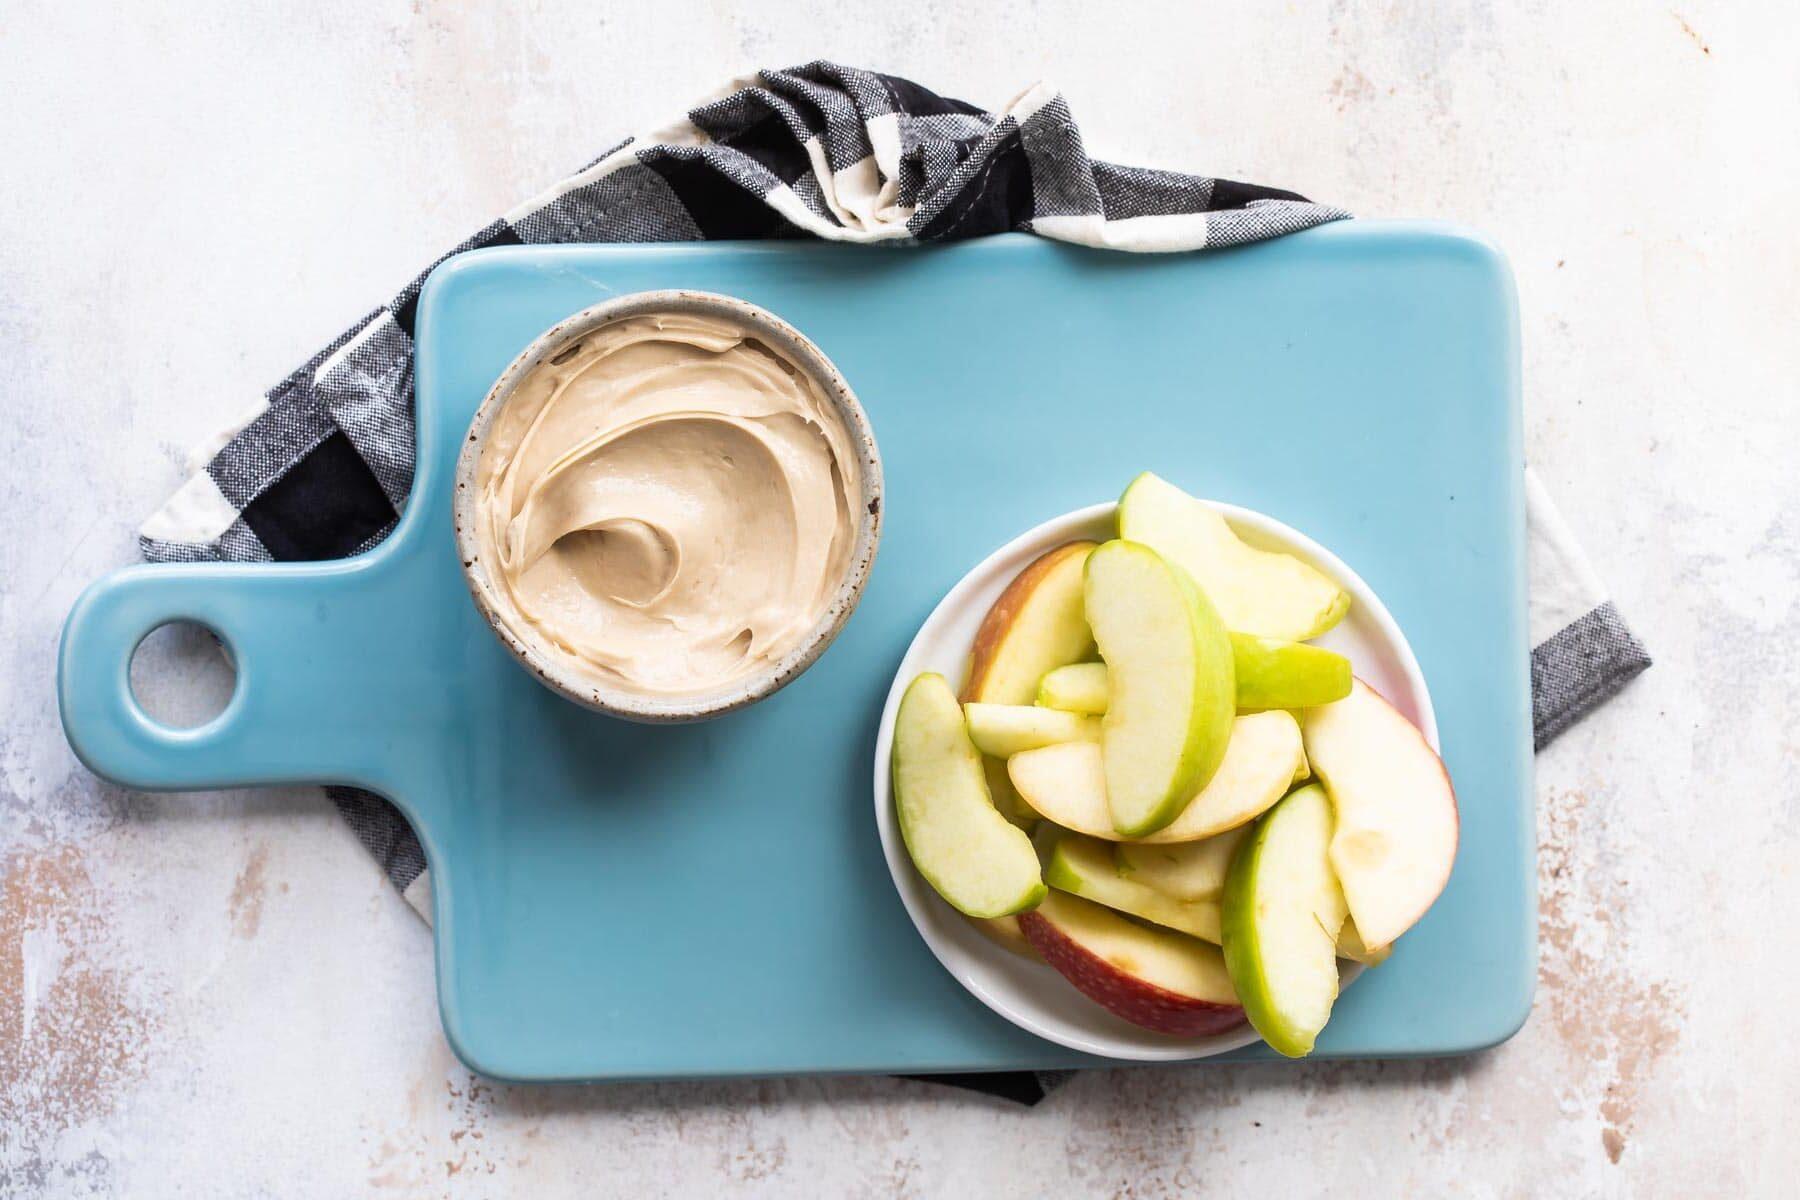 Caramel apple dip and apples on a teal platter.